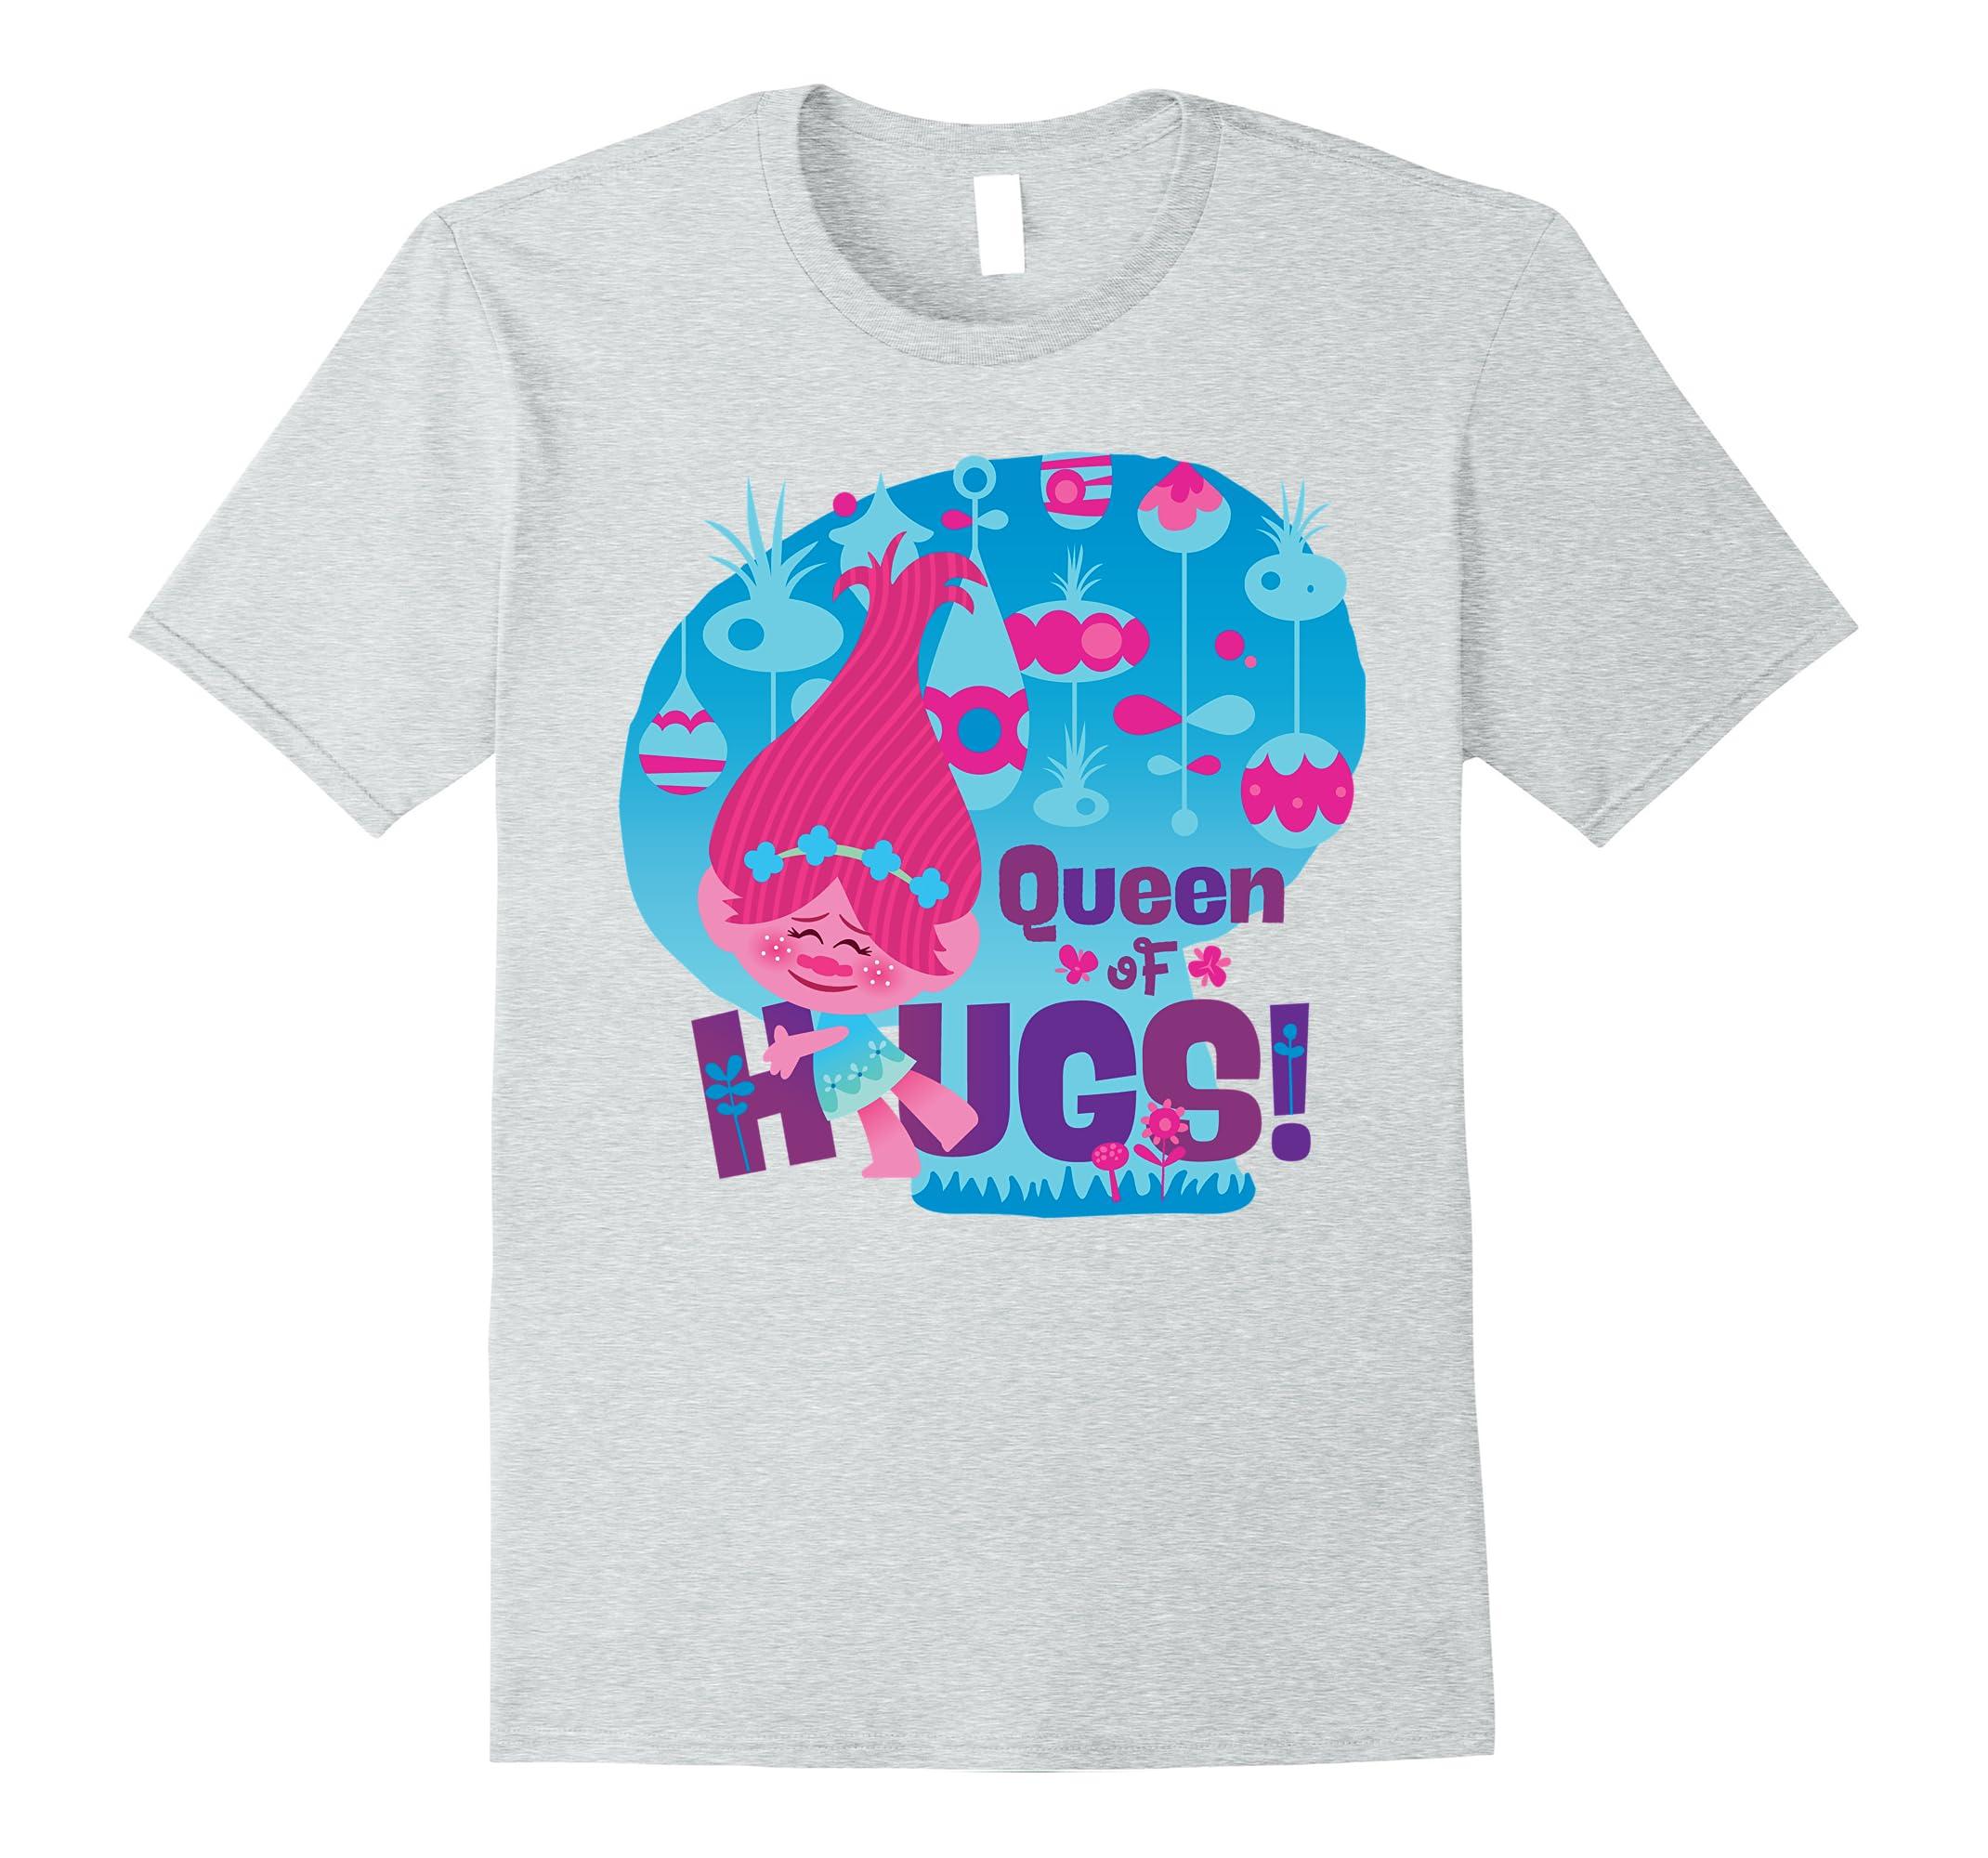 DreamWorks Trolls Queen Poppy T Shirt-Teechatpro